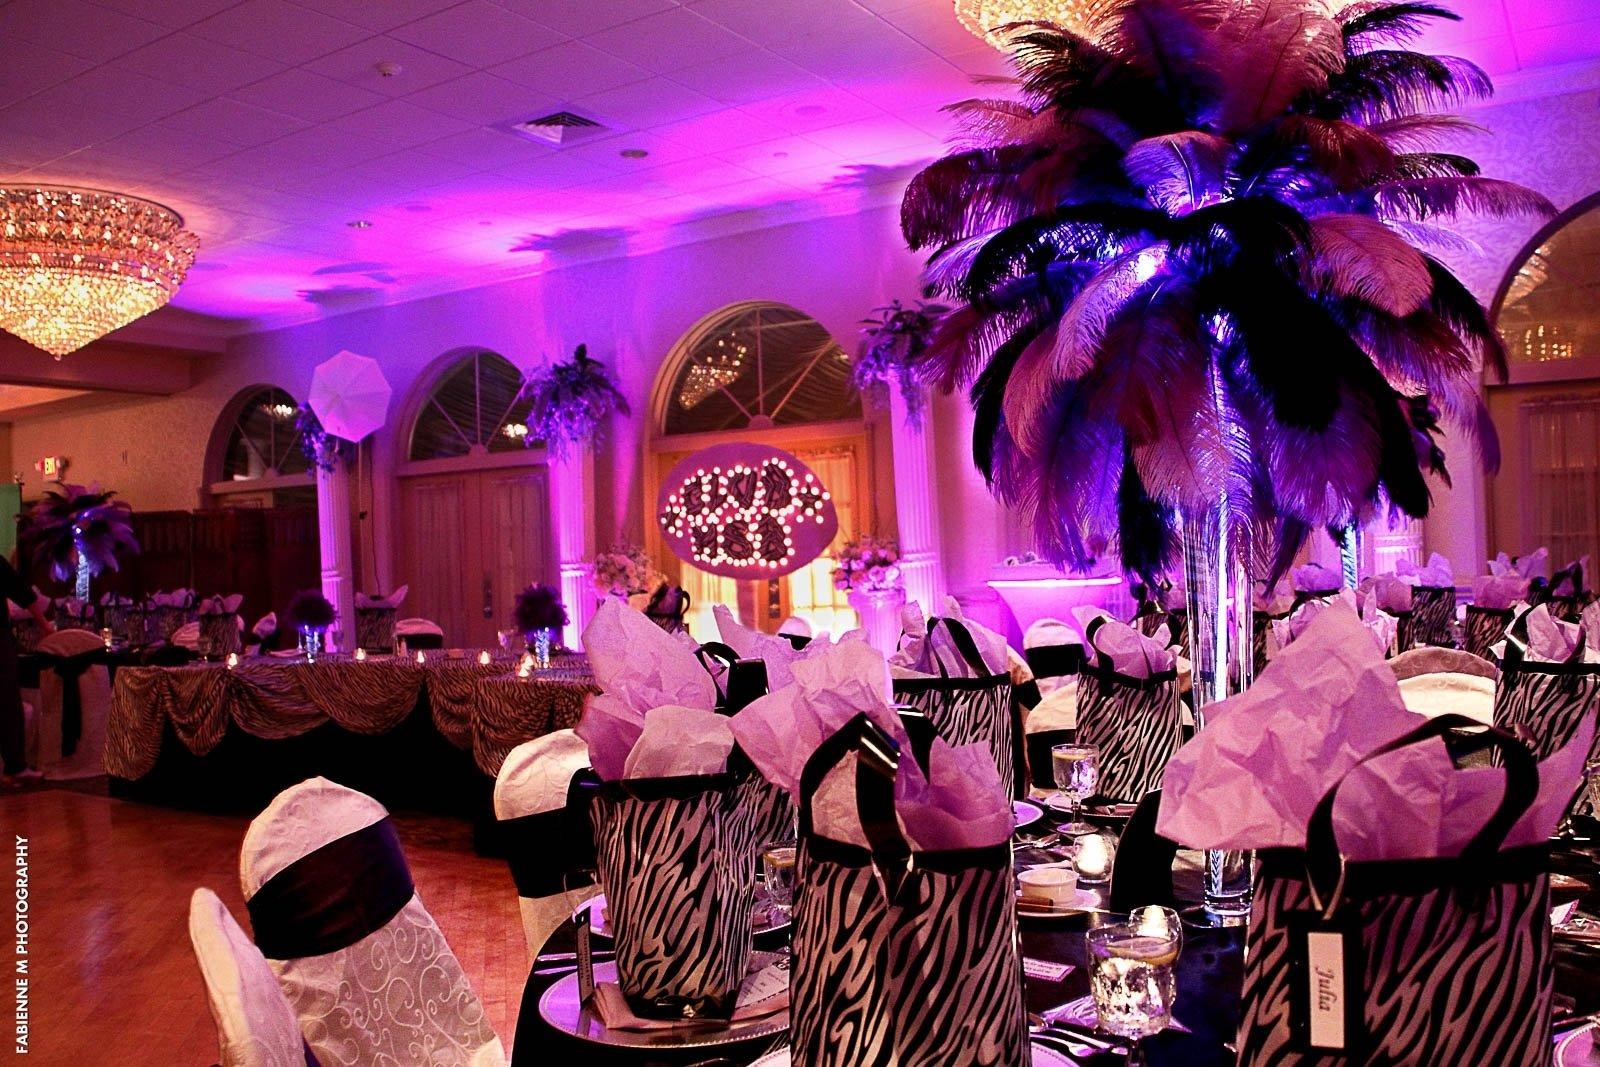 10 Elegant Masquerade Party Ideas Sweet 16 sweet 16 party ideas versailles ballroom 1 2020